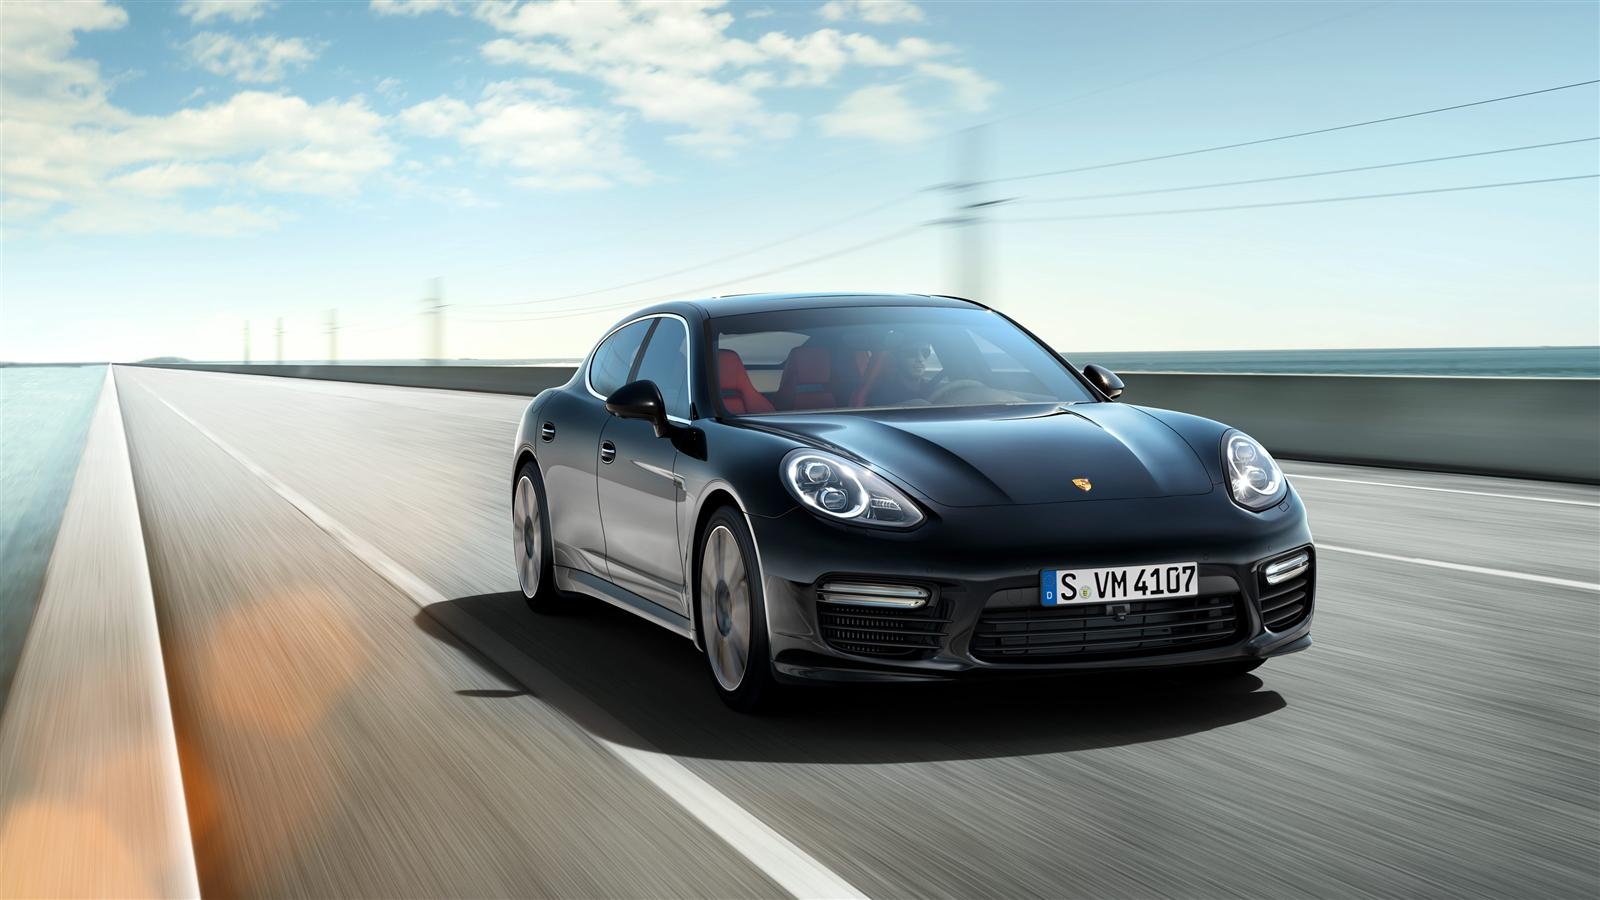 ��� �������� ���� ����� ���� �������� ����� �� 2014 Porsche Panamera Turbo S